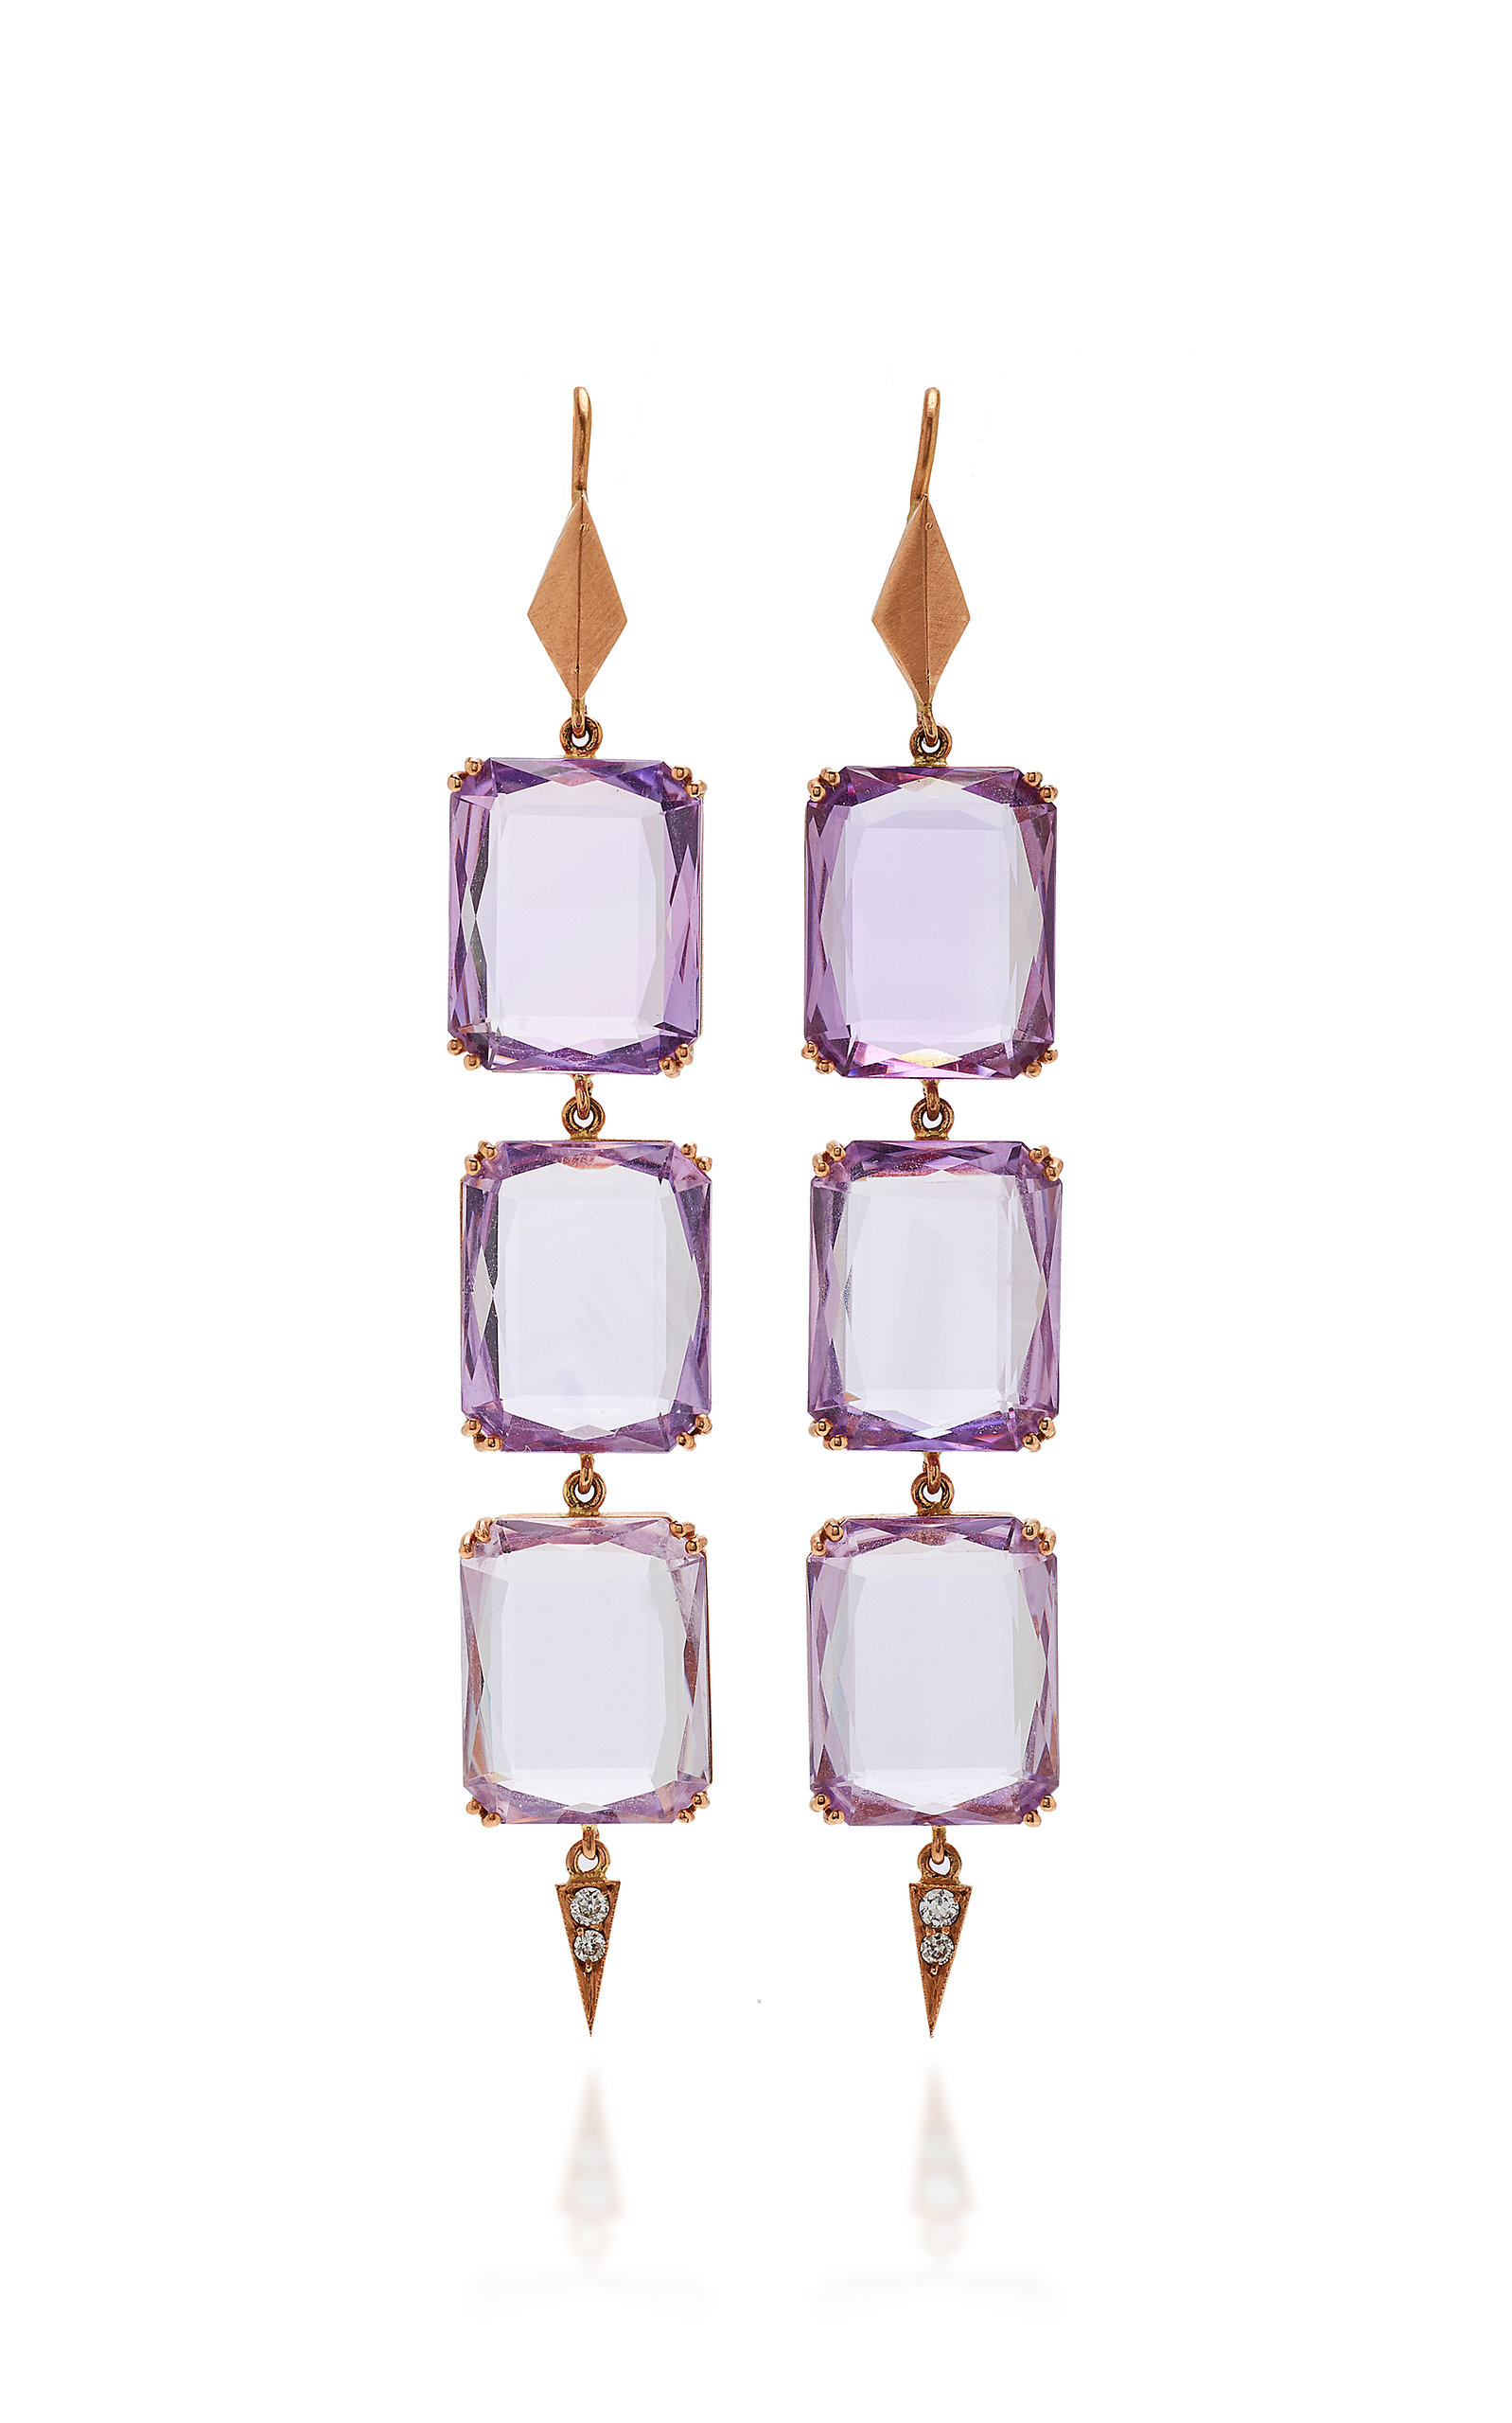 SYLVA & CIE 14K Rose Gold Amethyst And Diamond Drop Earrings in Purple